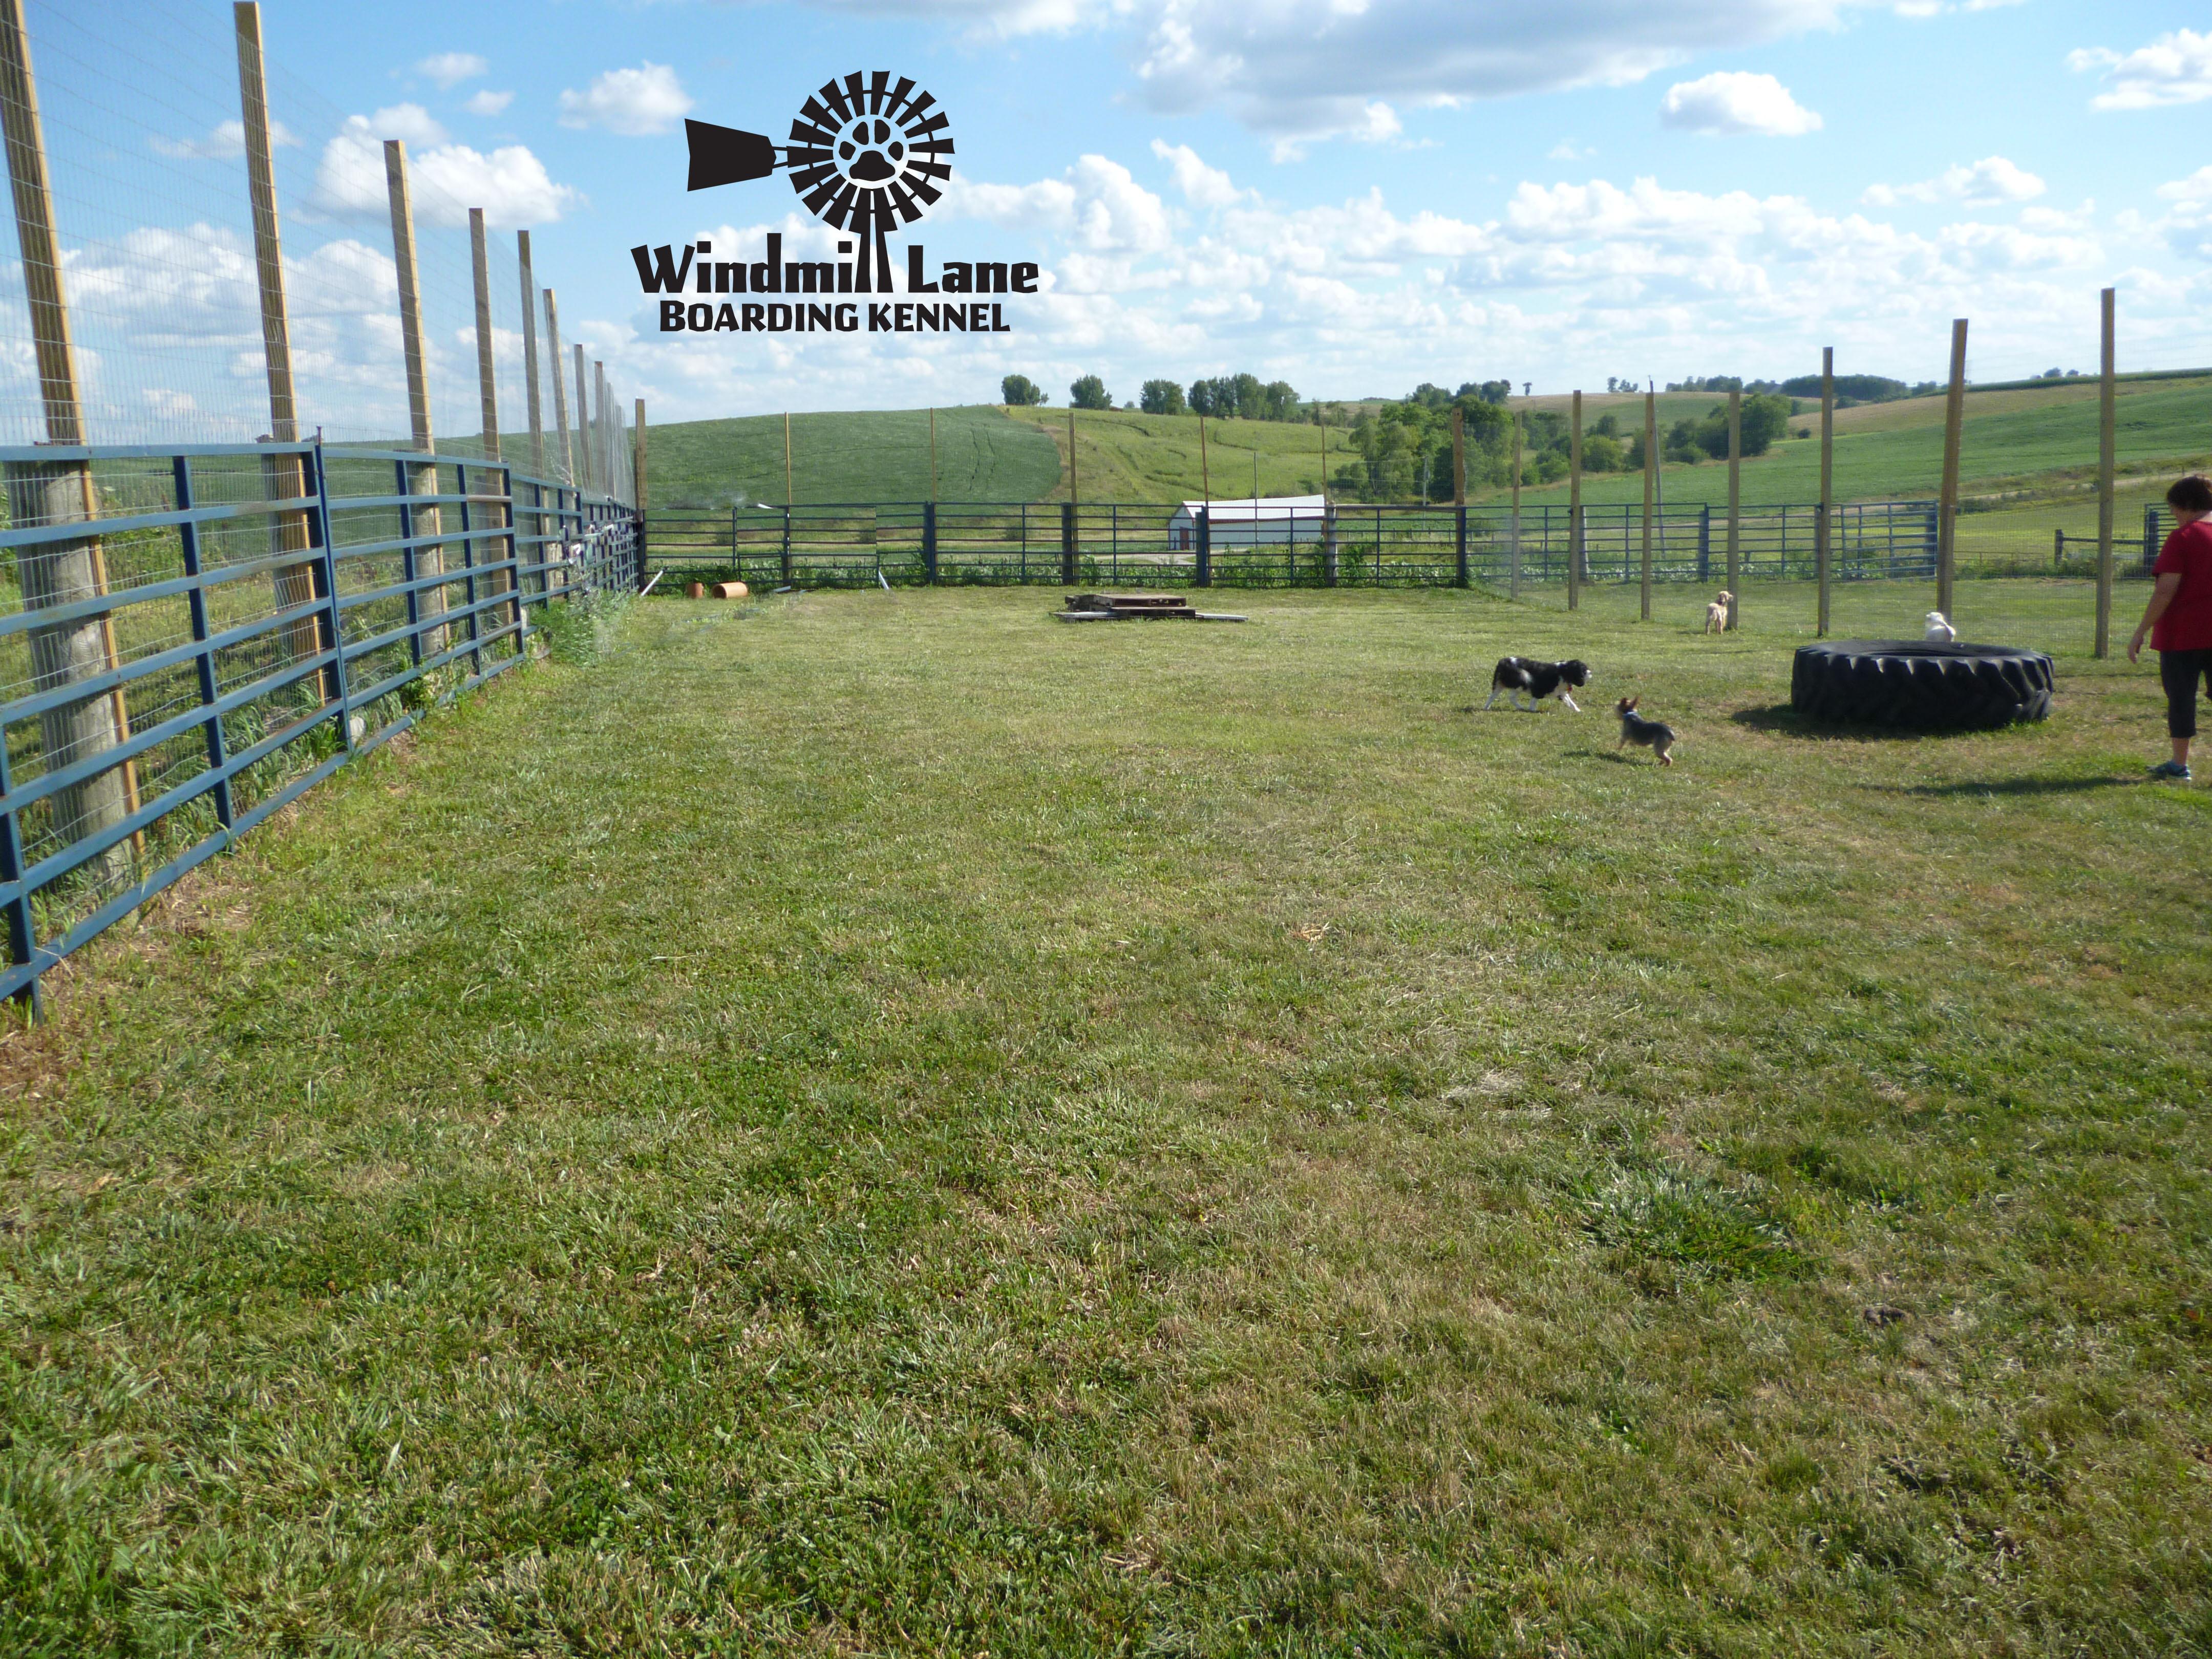 Windmill_Lane_Boarding_Kennel-large-play-area-2-copy